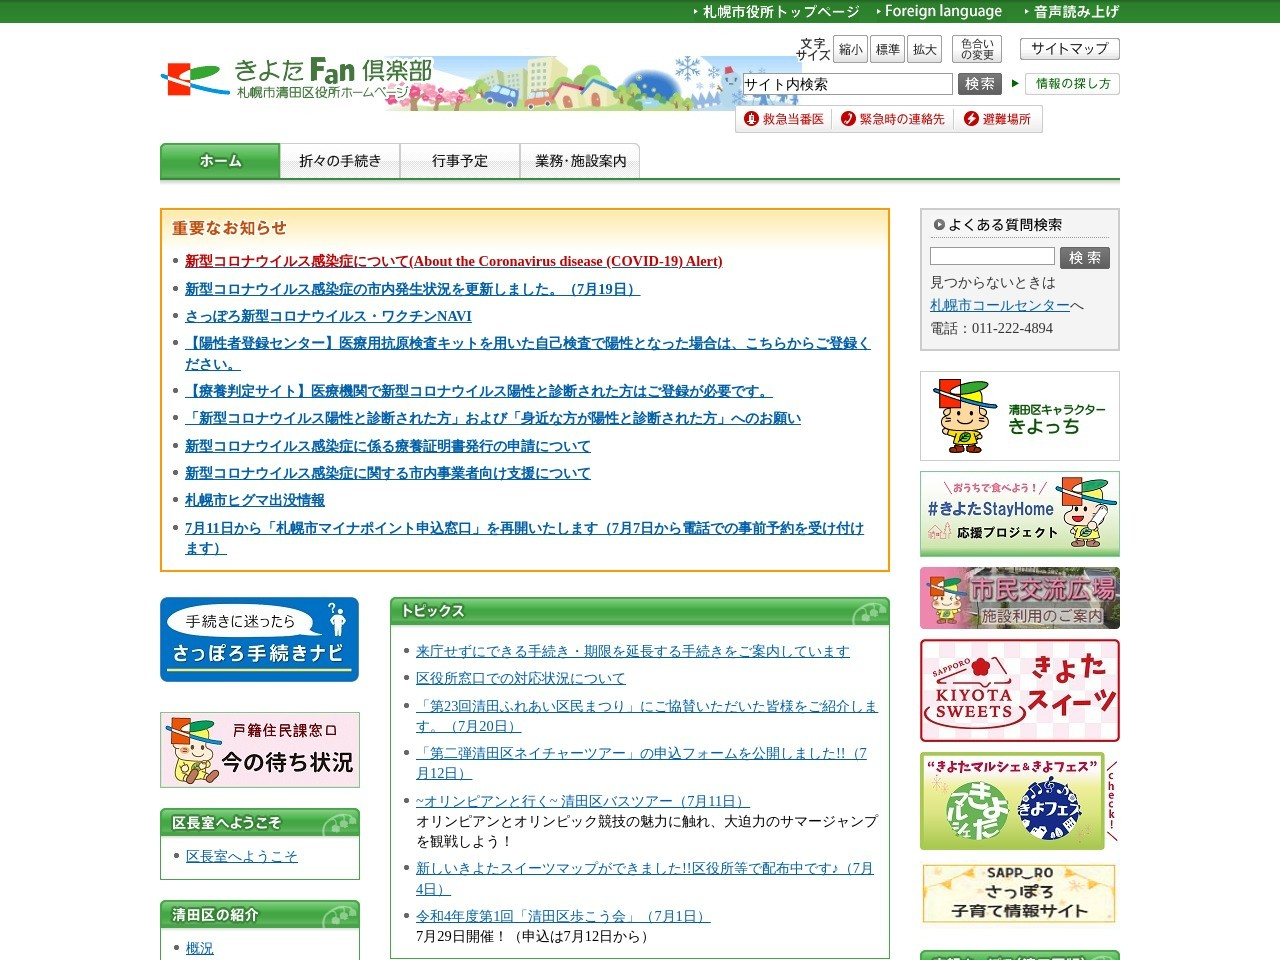 http://www.city.sapporo.jp/kiyota/